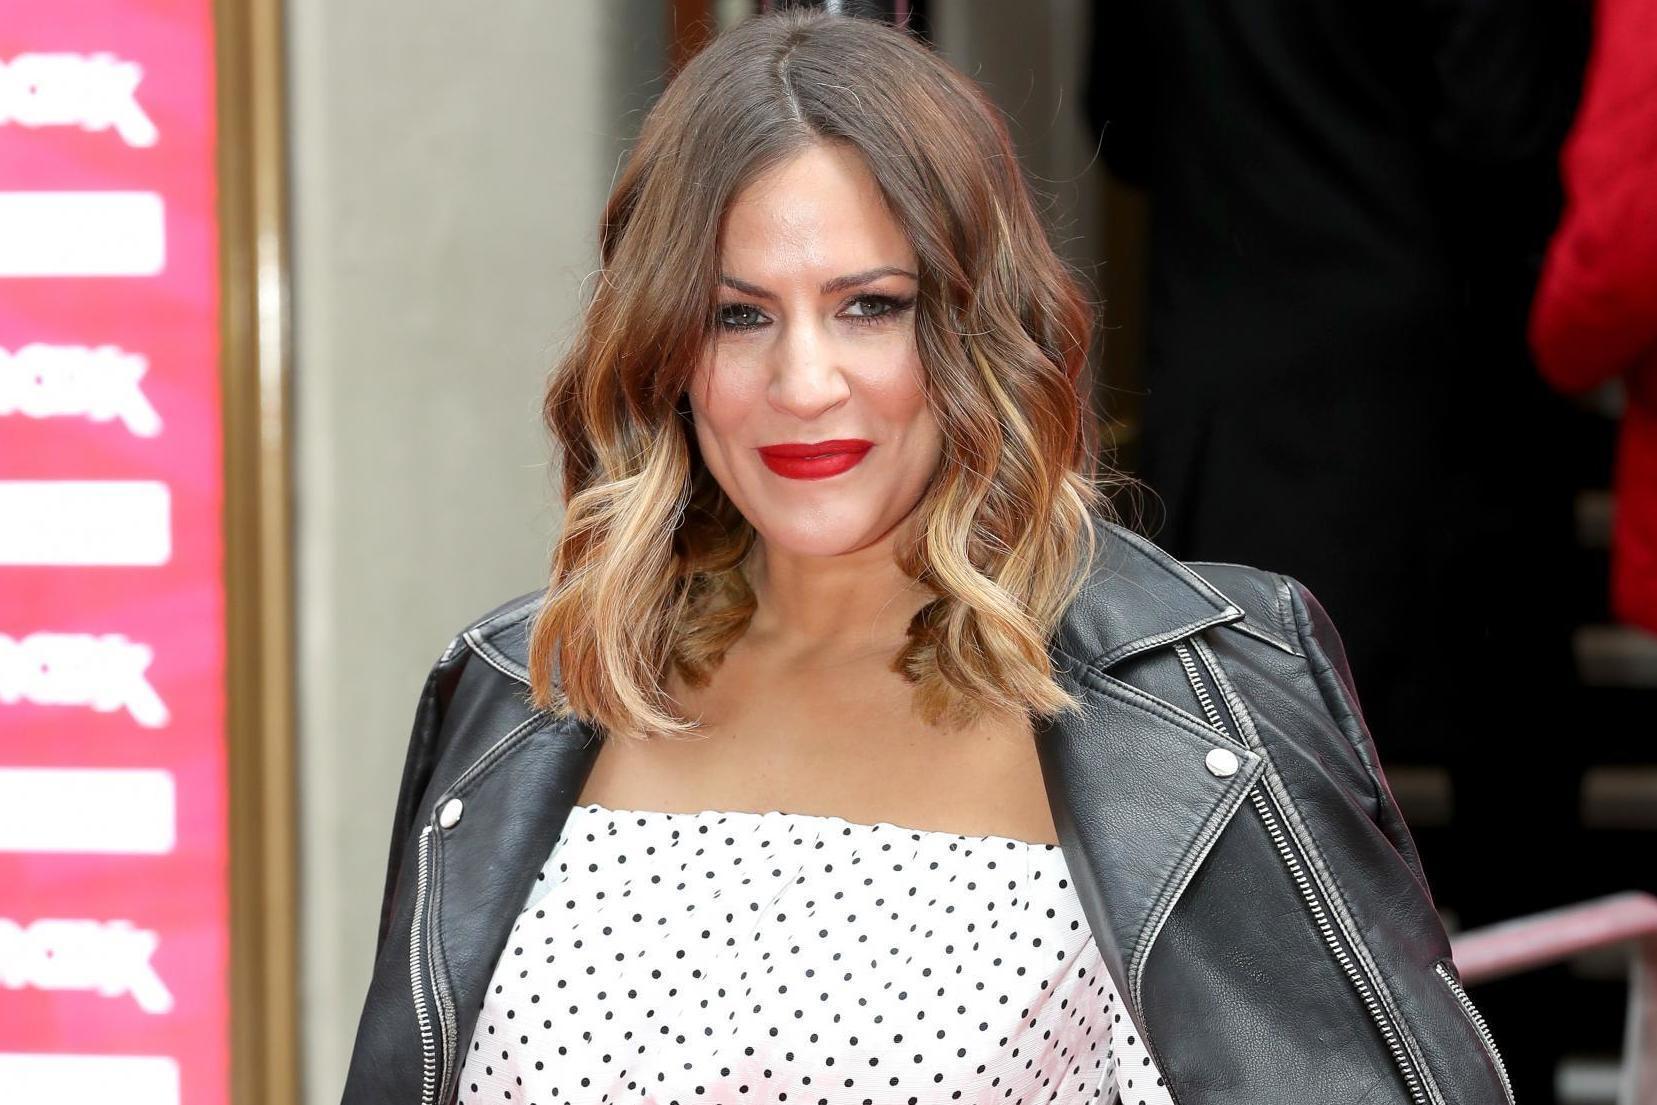 Love Island host Caroline Flack announces split from fiancé Andrew Brady